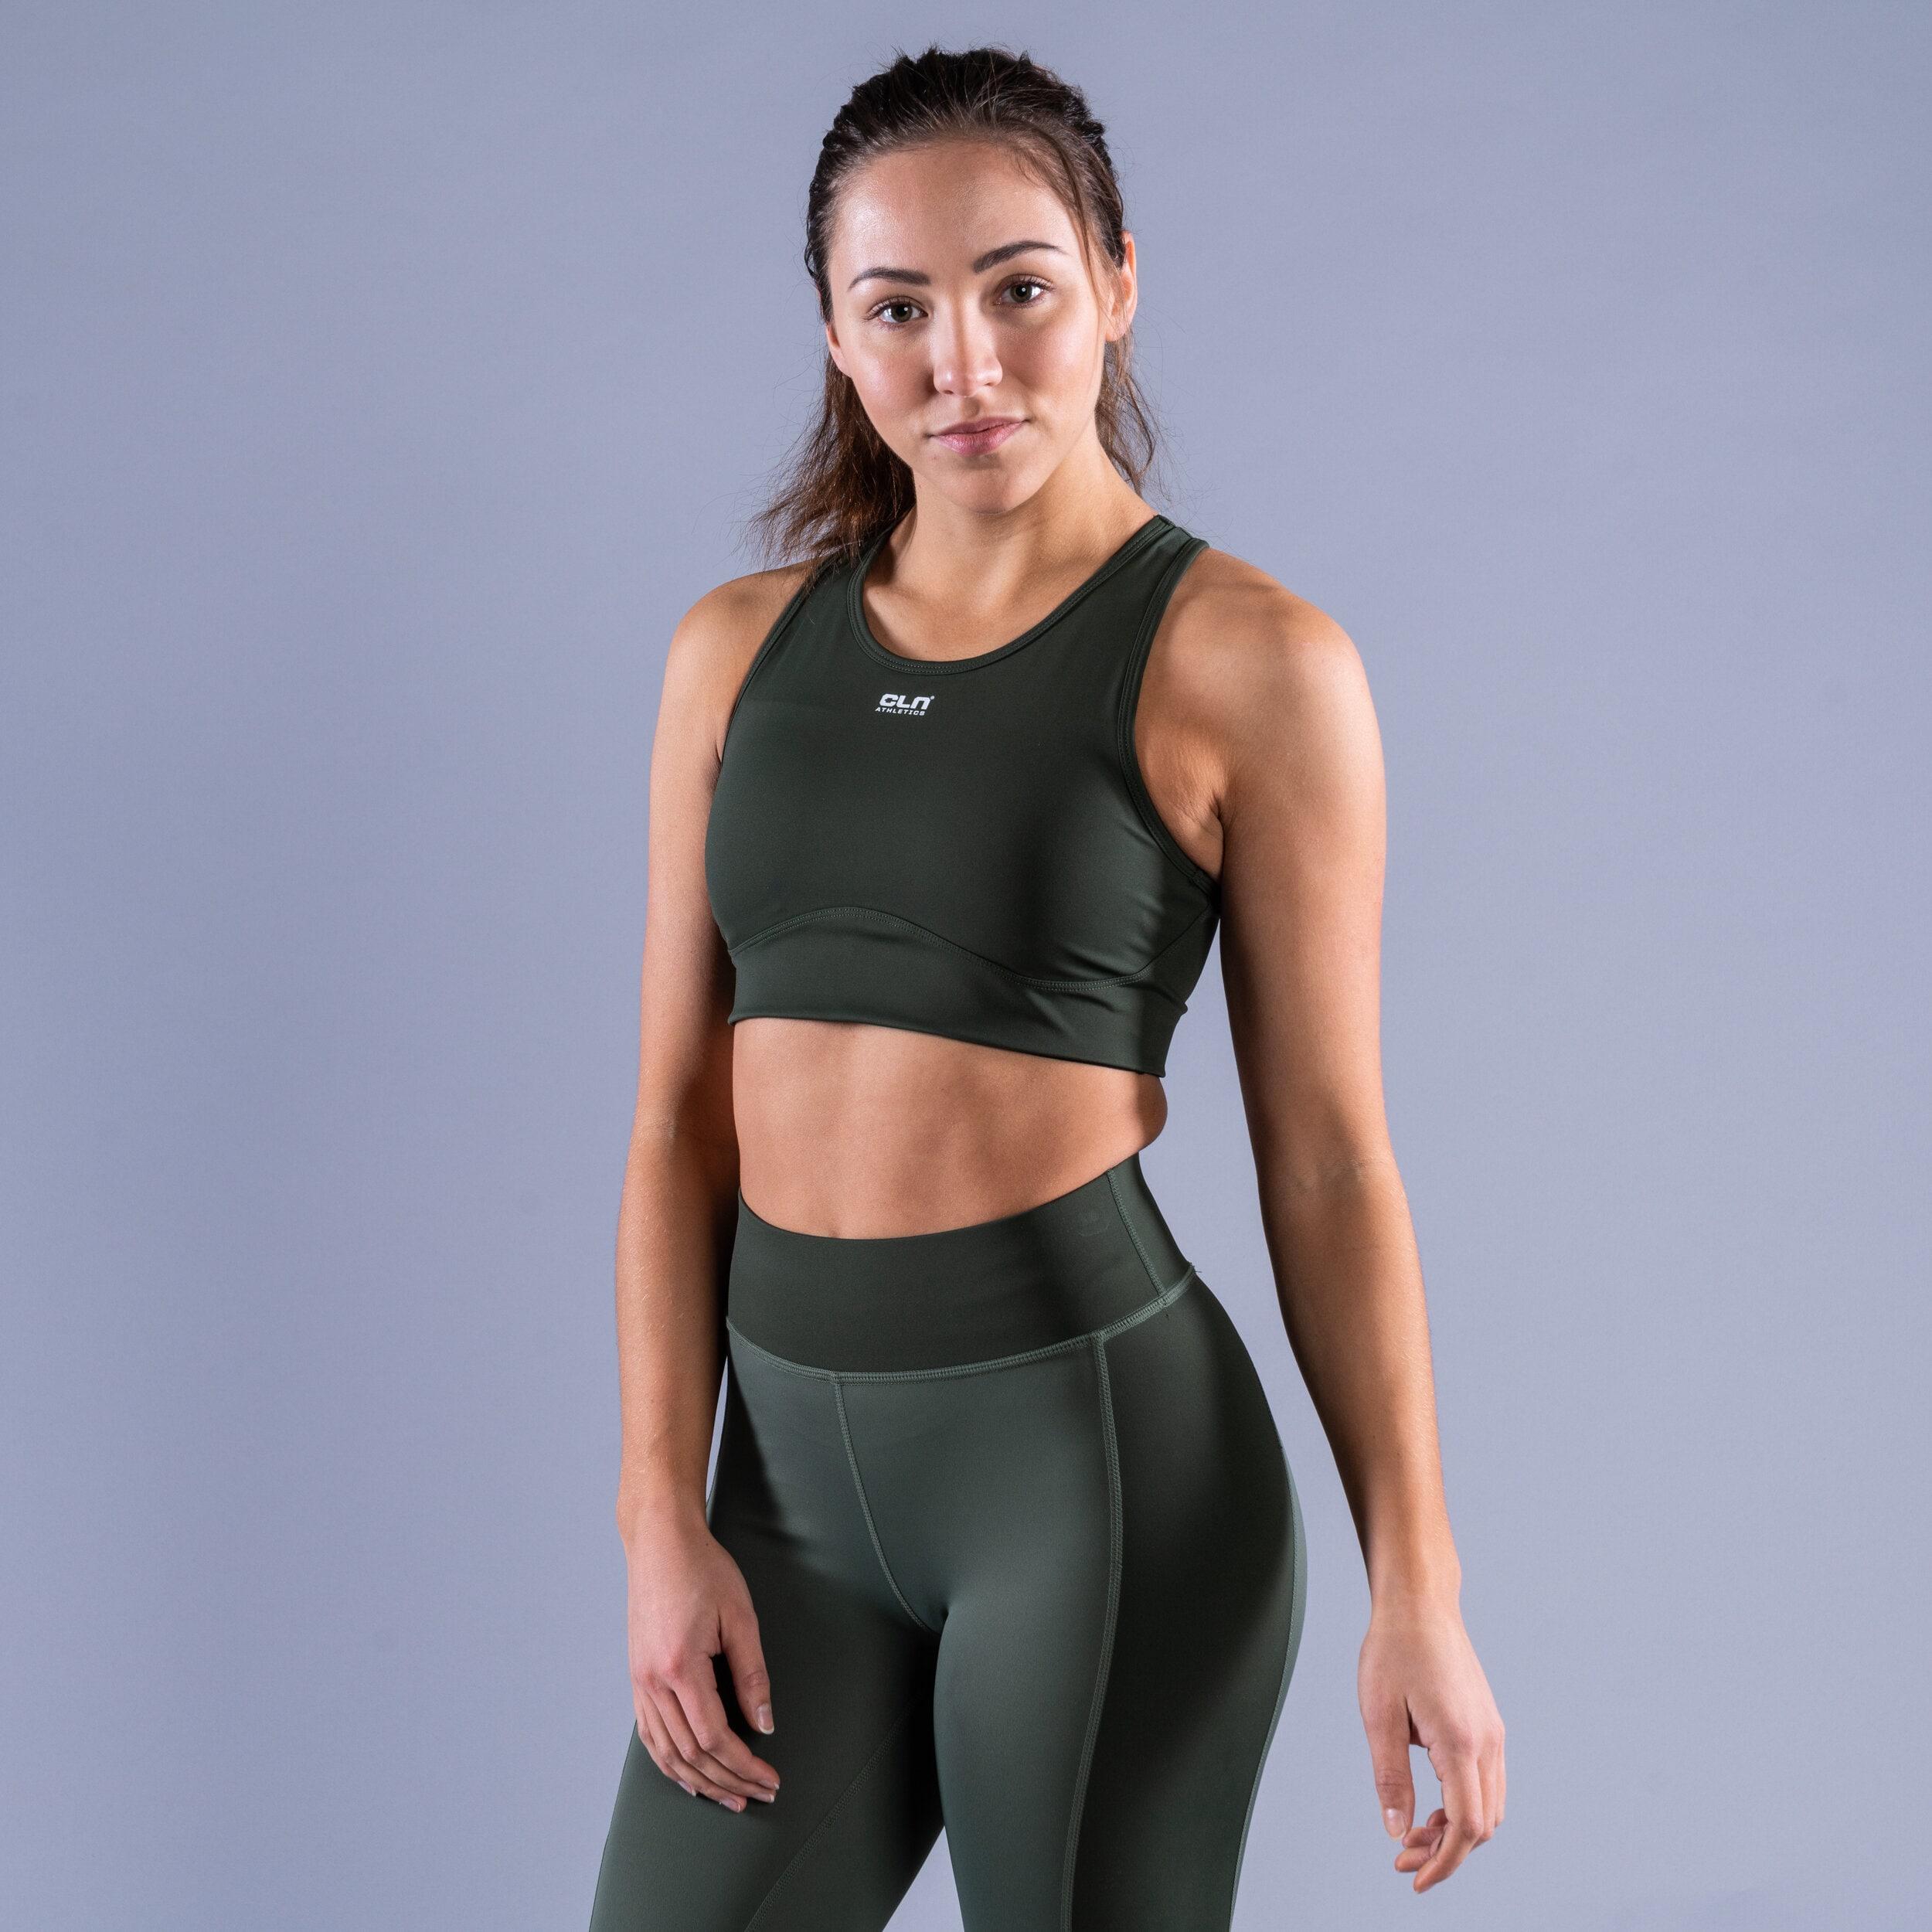 CLN Intense sport bra Dark green